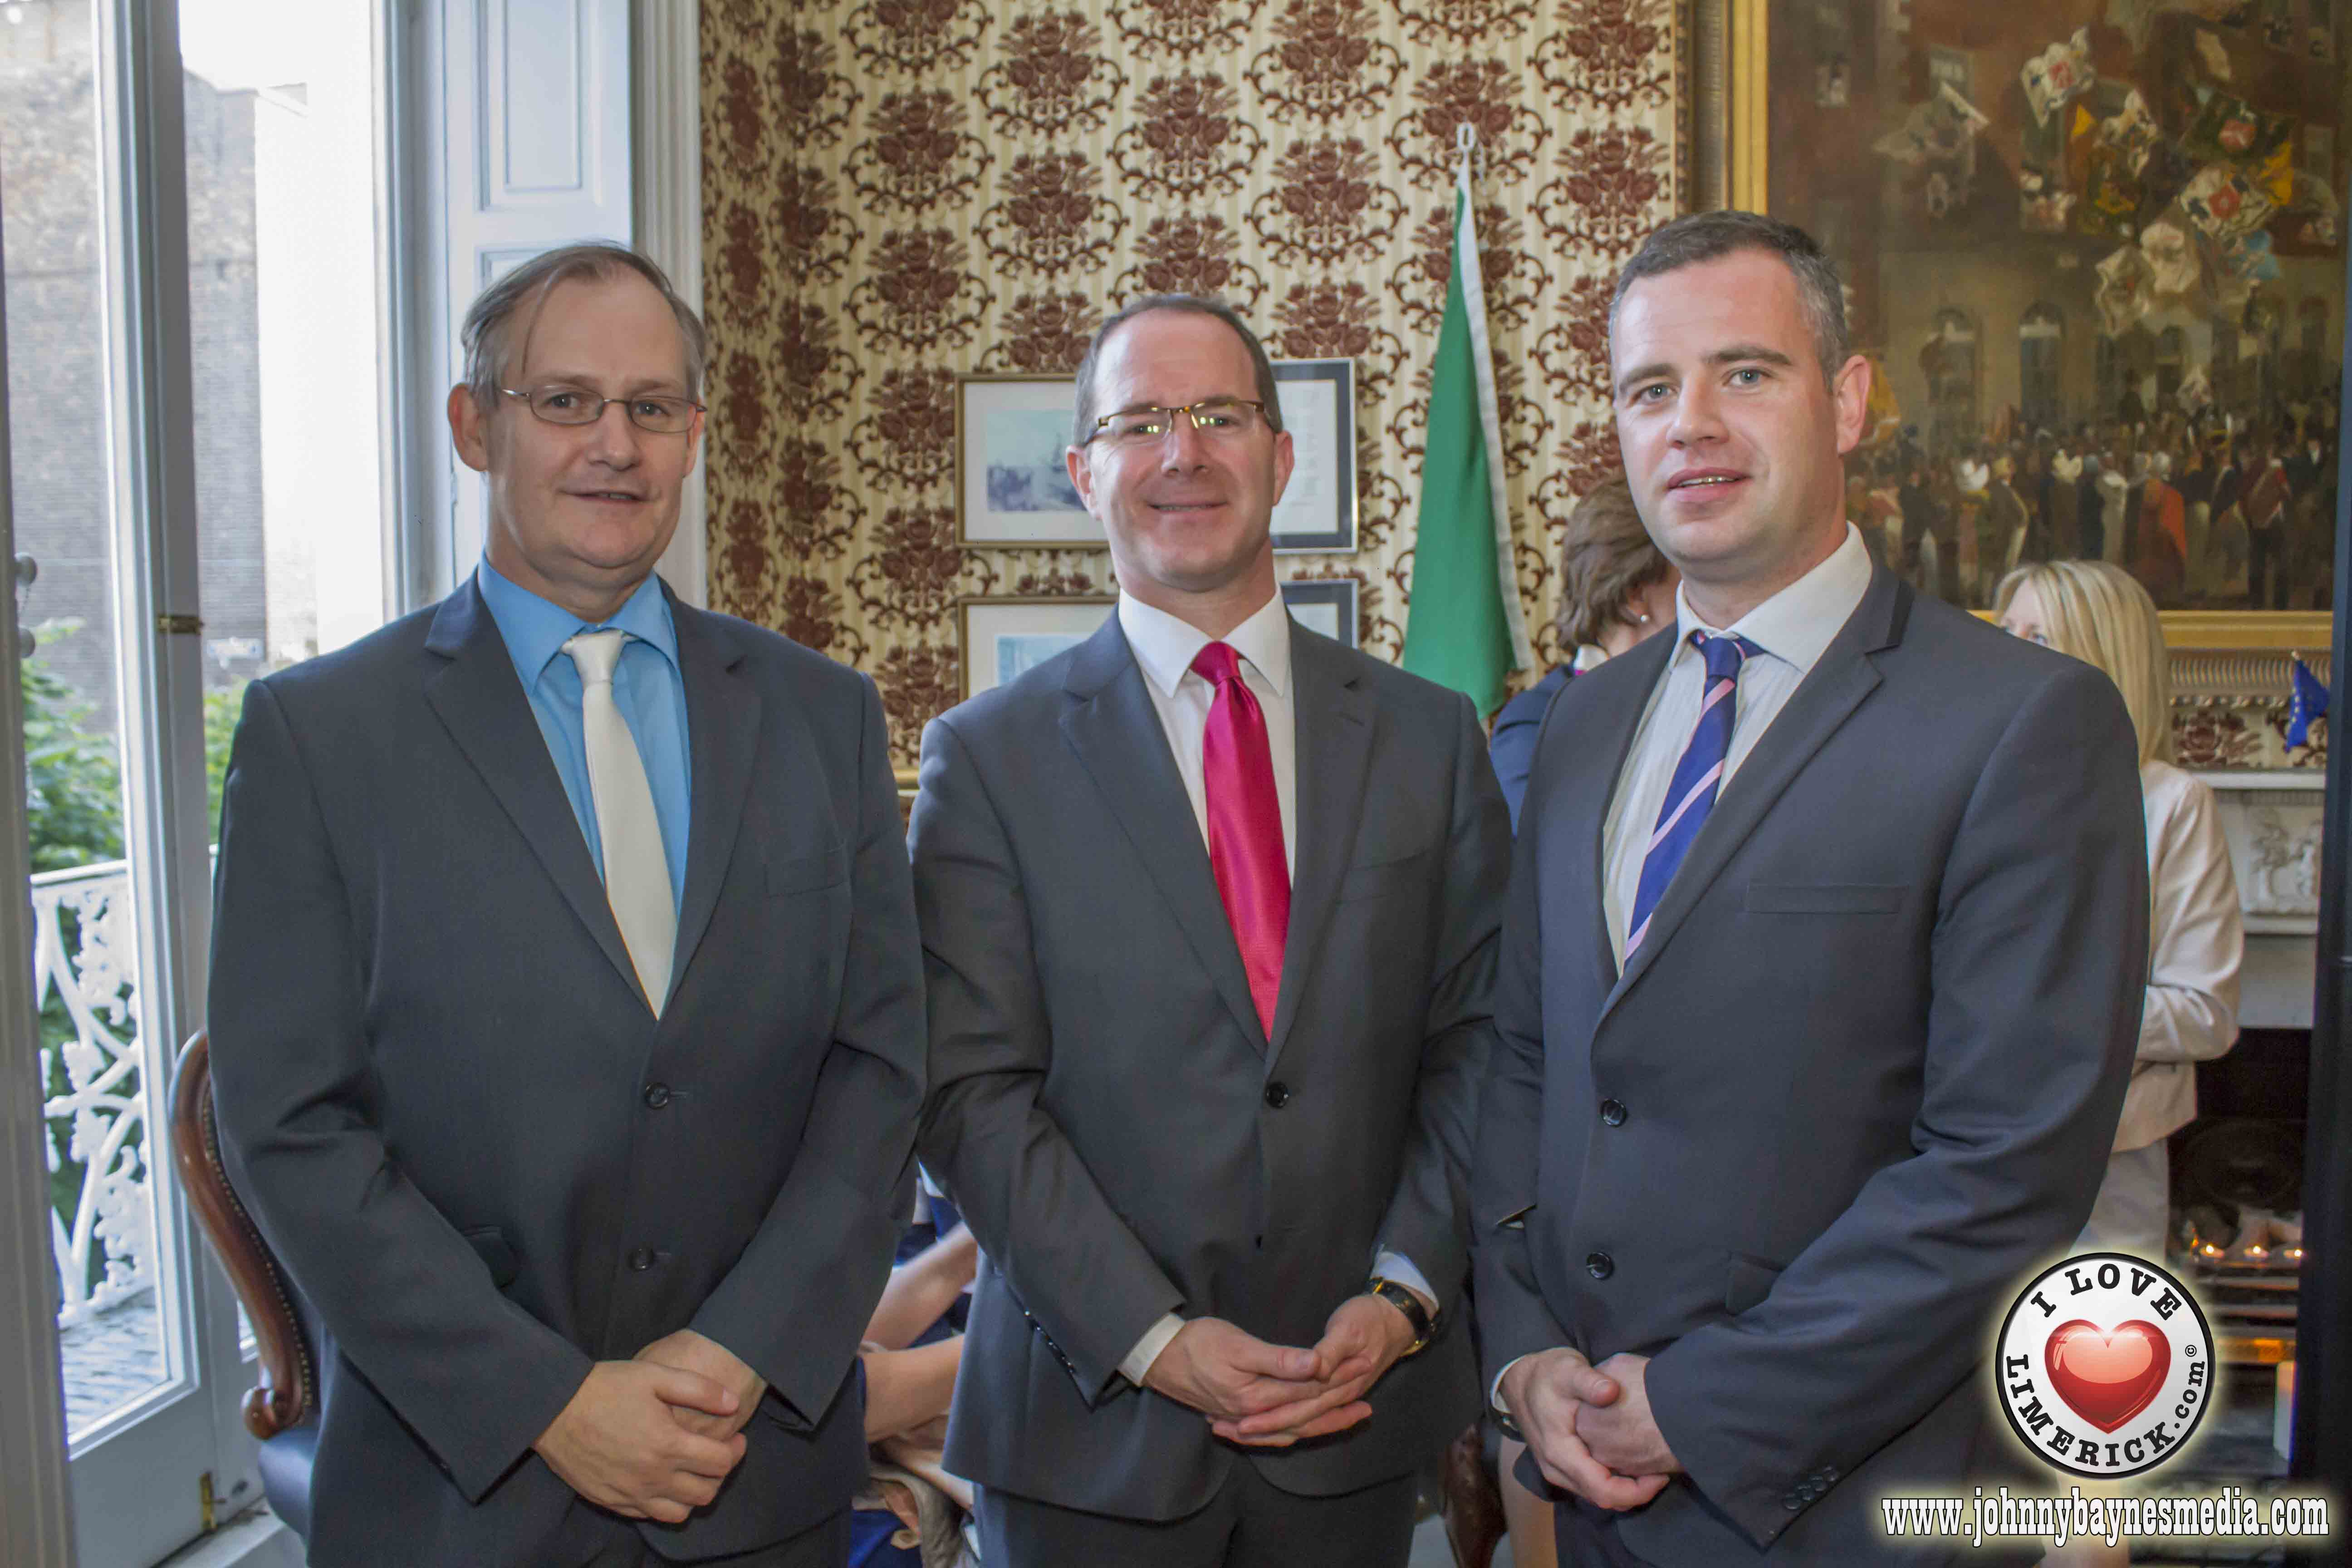 Limerick Chamber 200th Anniversary